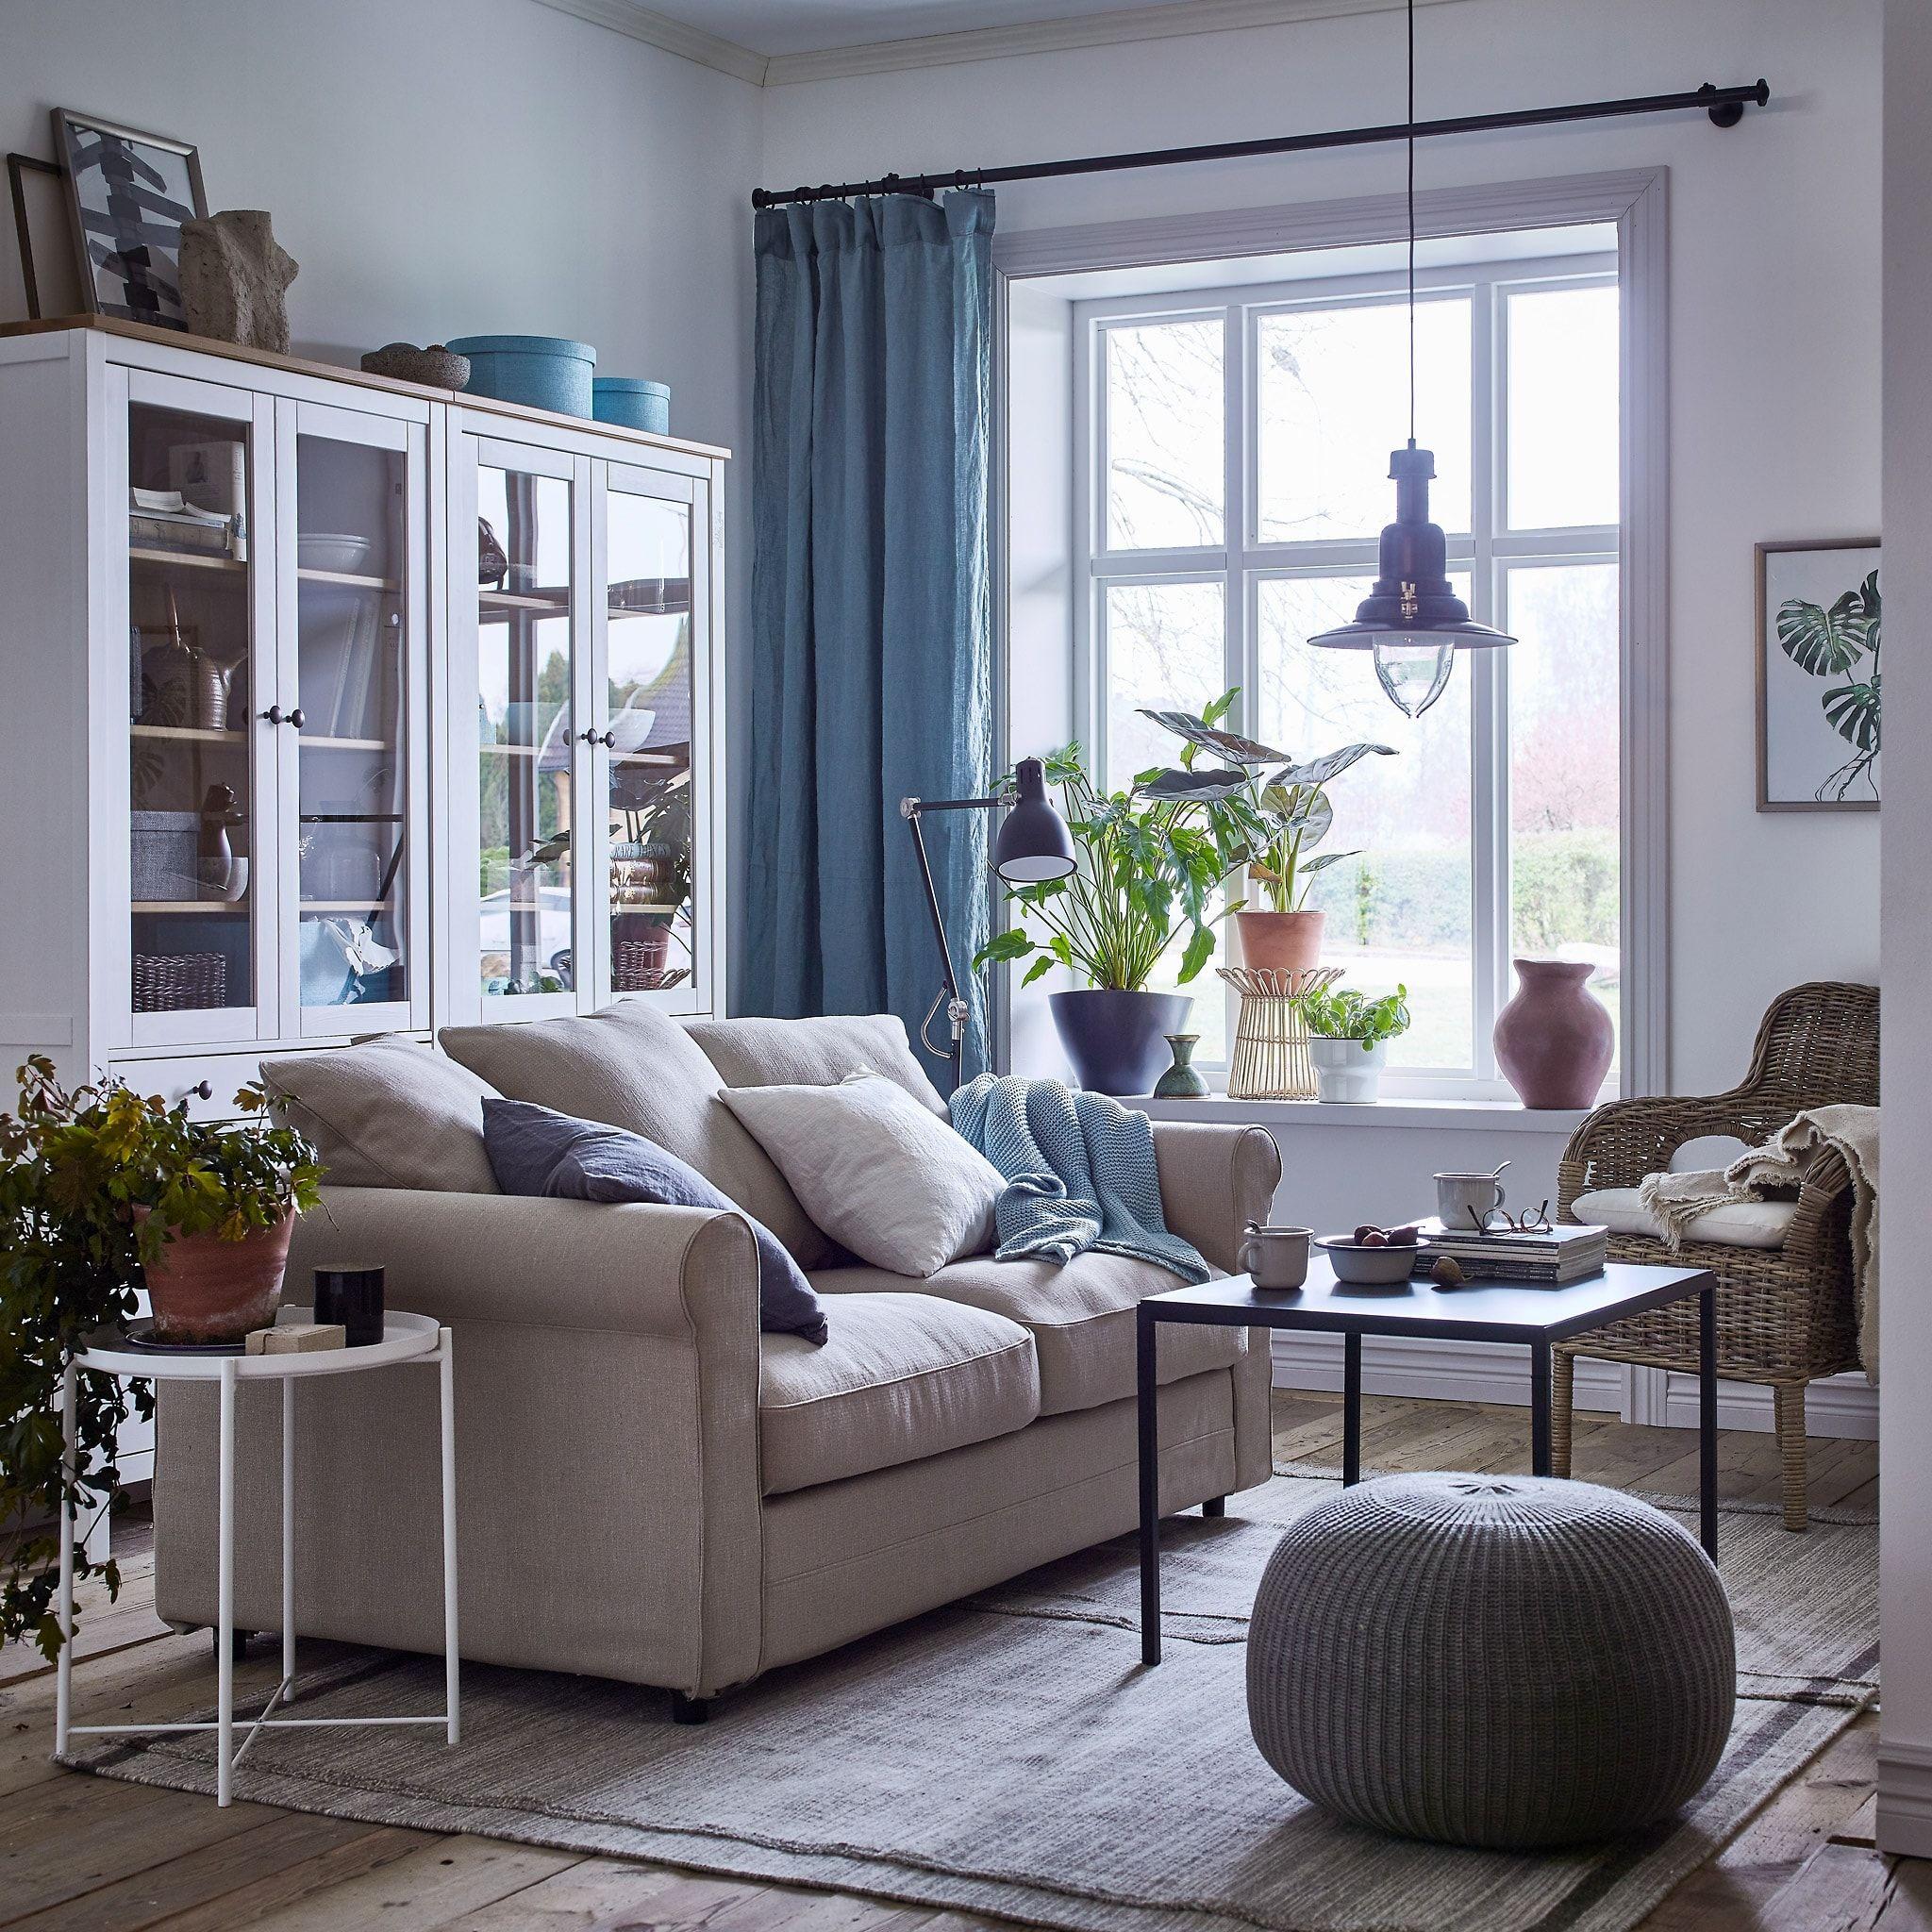 Ikea Living Room Furniture To Online In Ikea Living Room